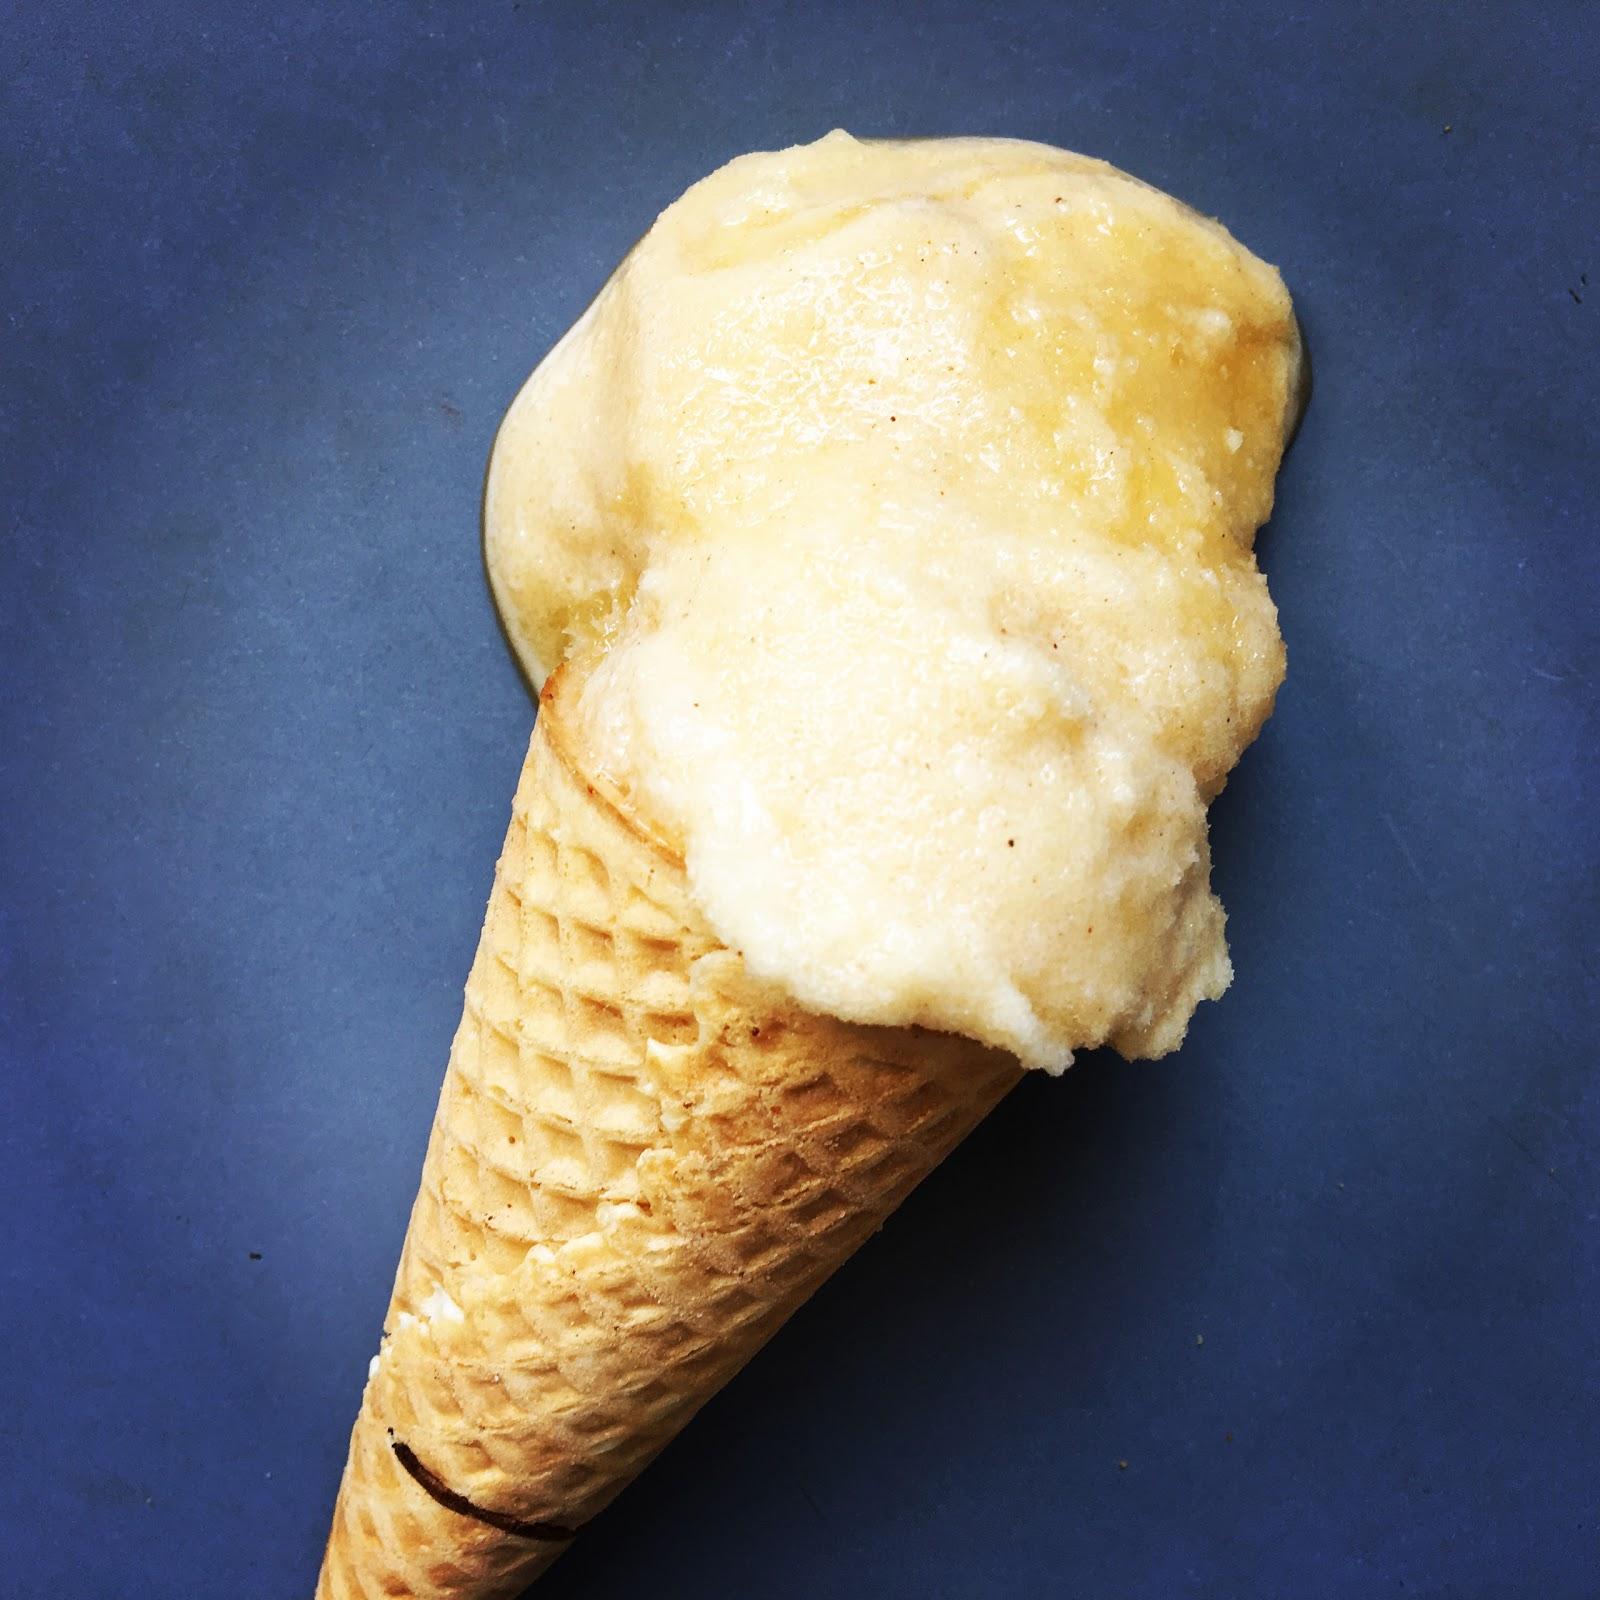 Ice cream daze